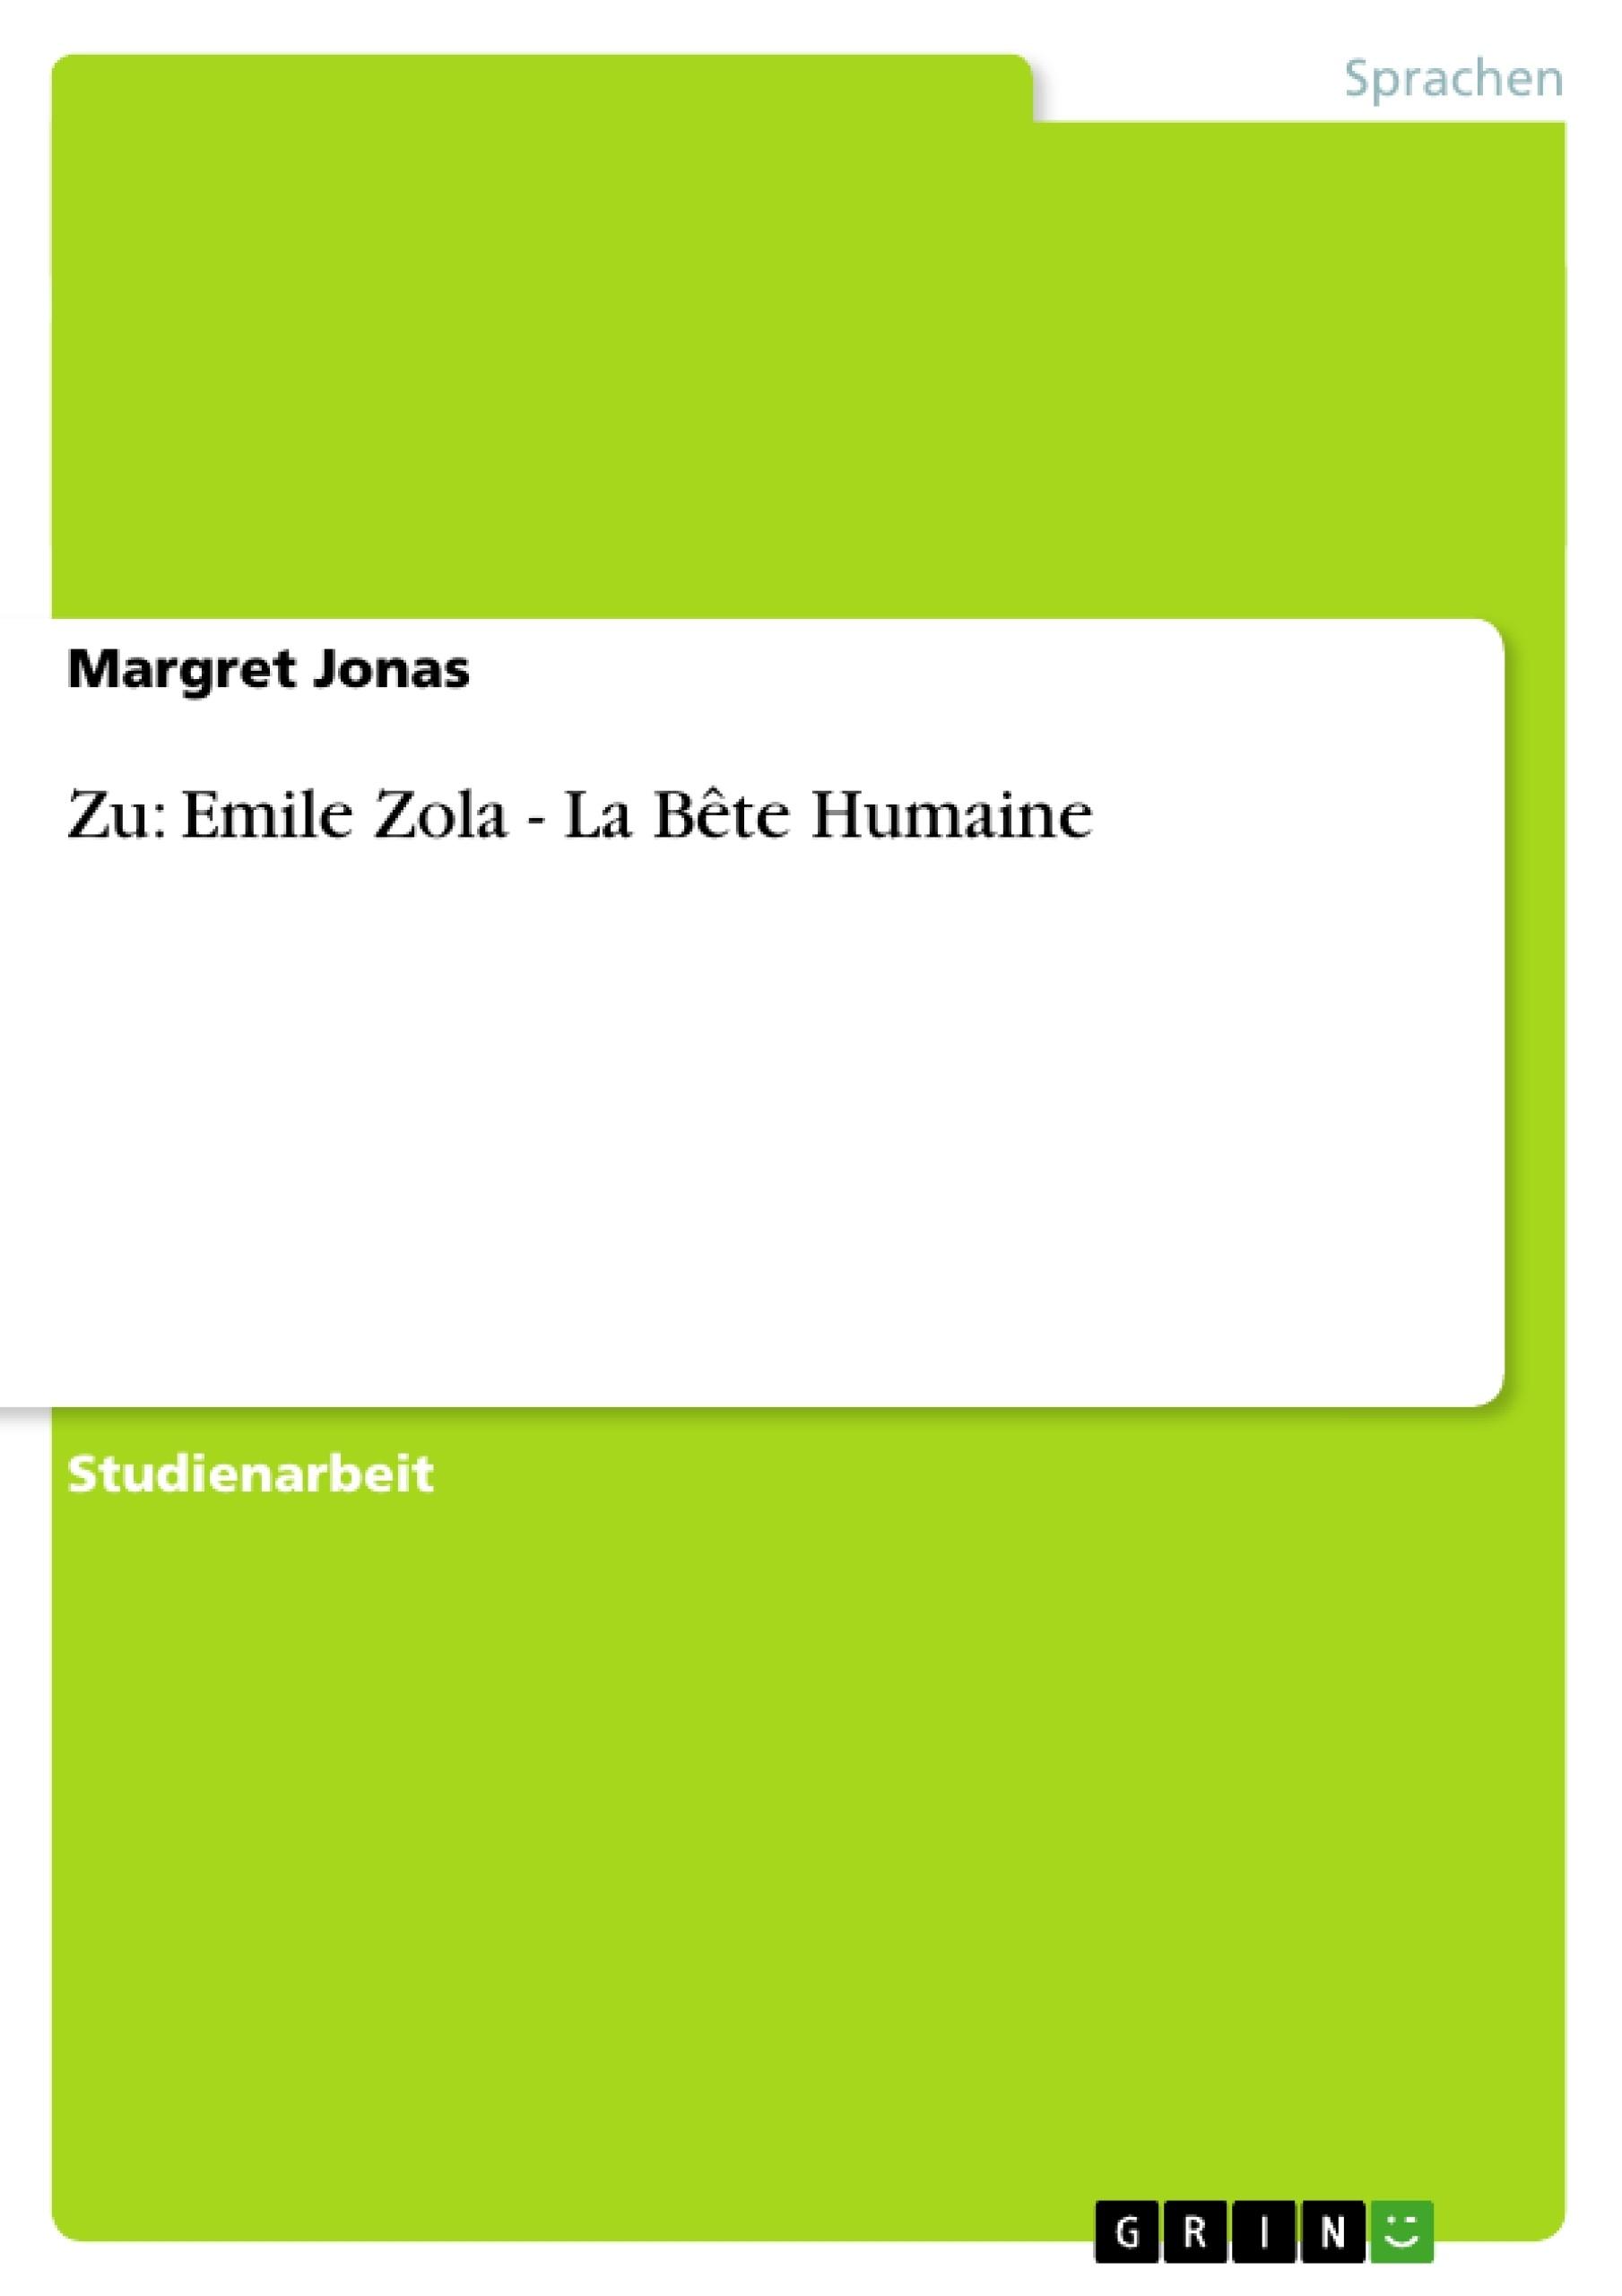 Titel: Zu: Emile Zola - La Bête Humaine